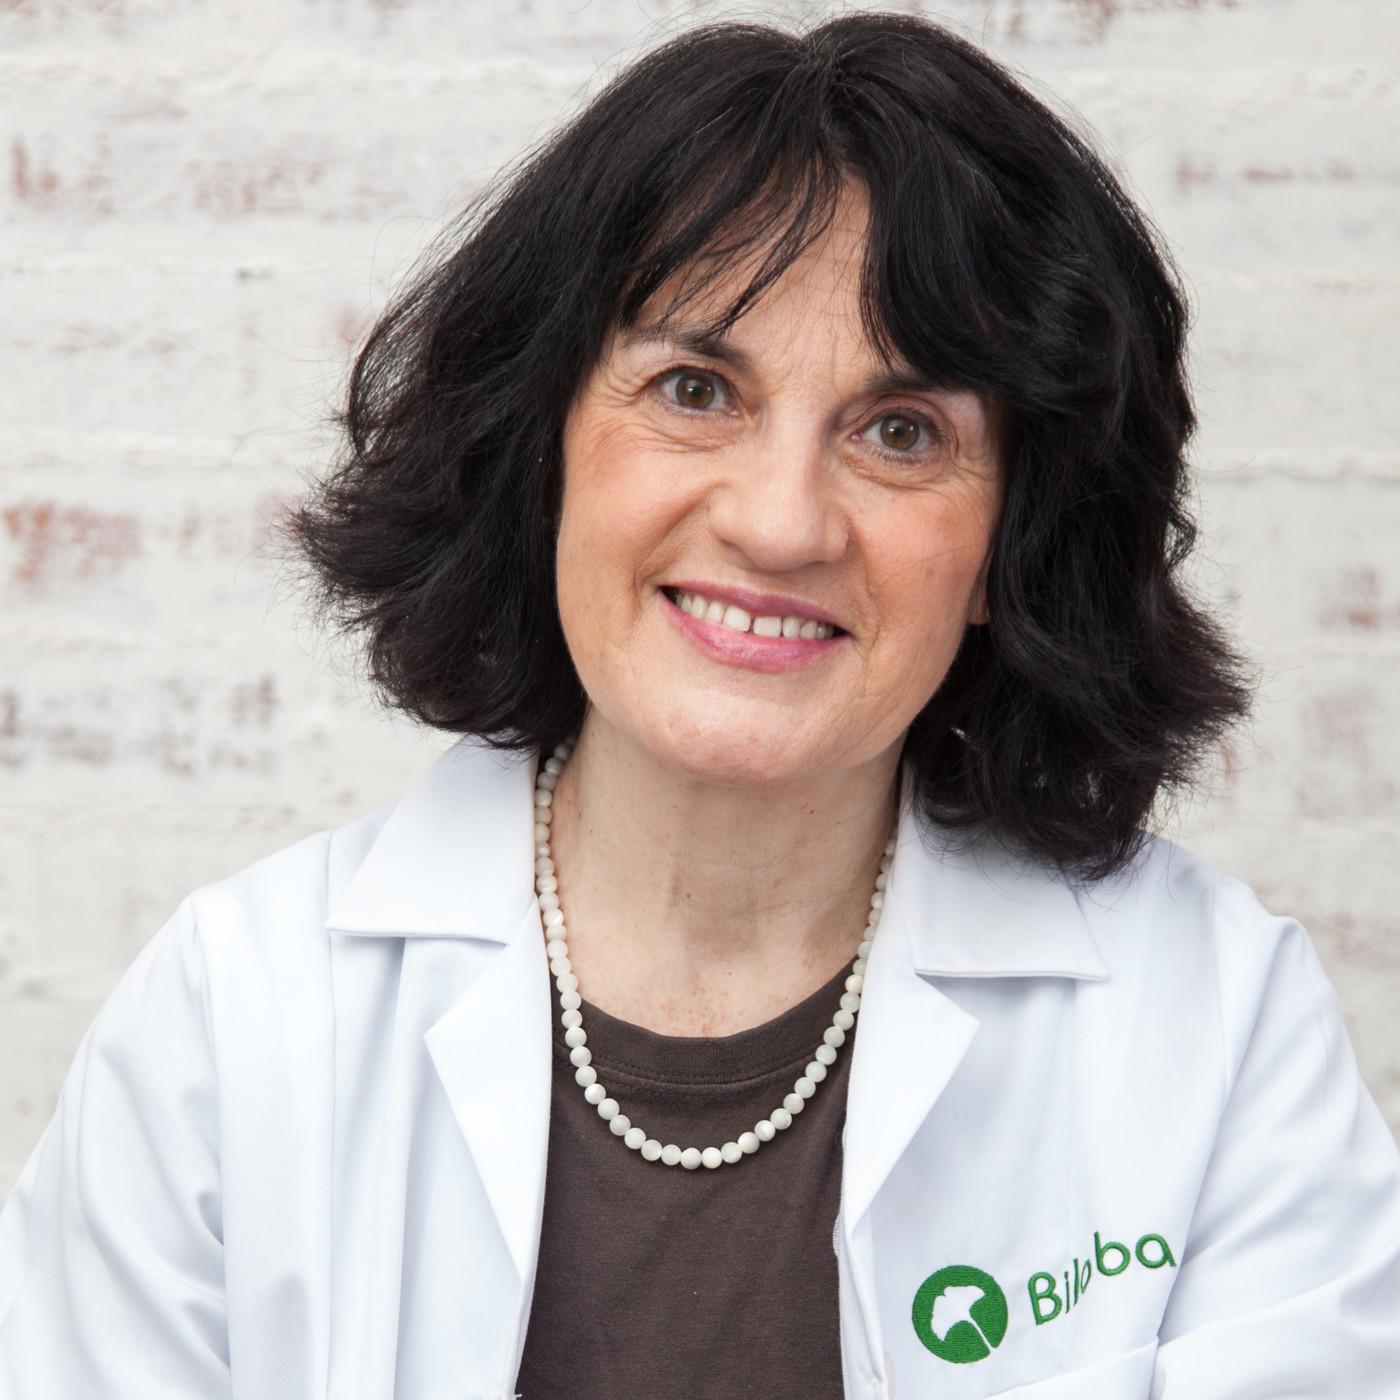 Dra. Nuria Lorite Ayán - LVB